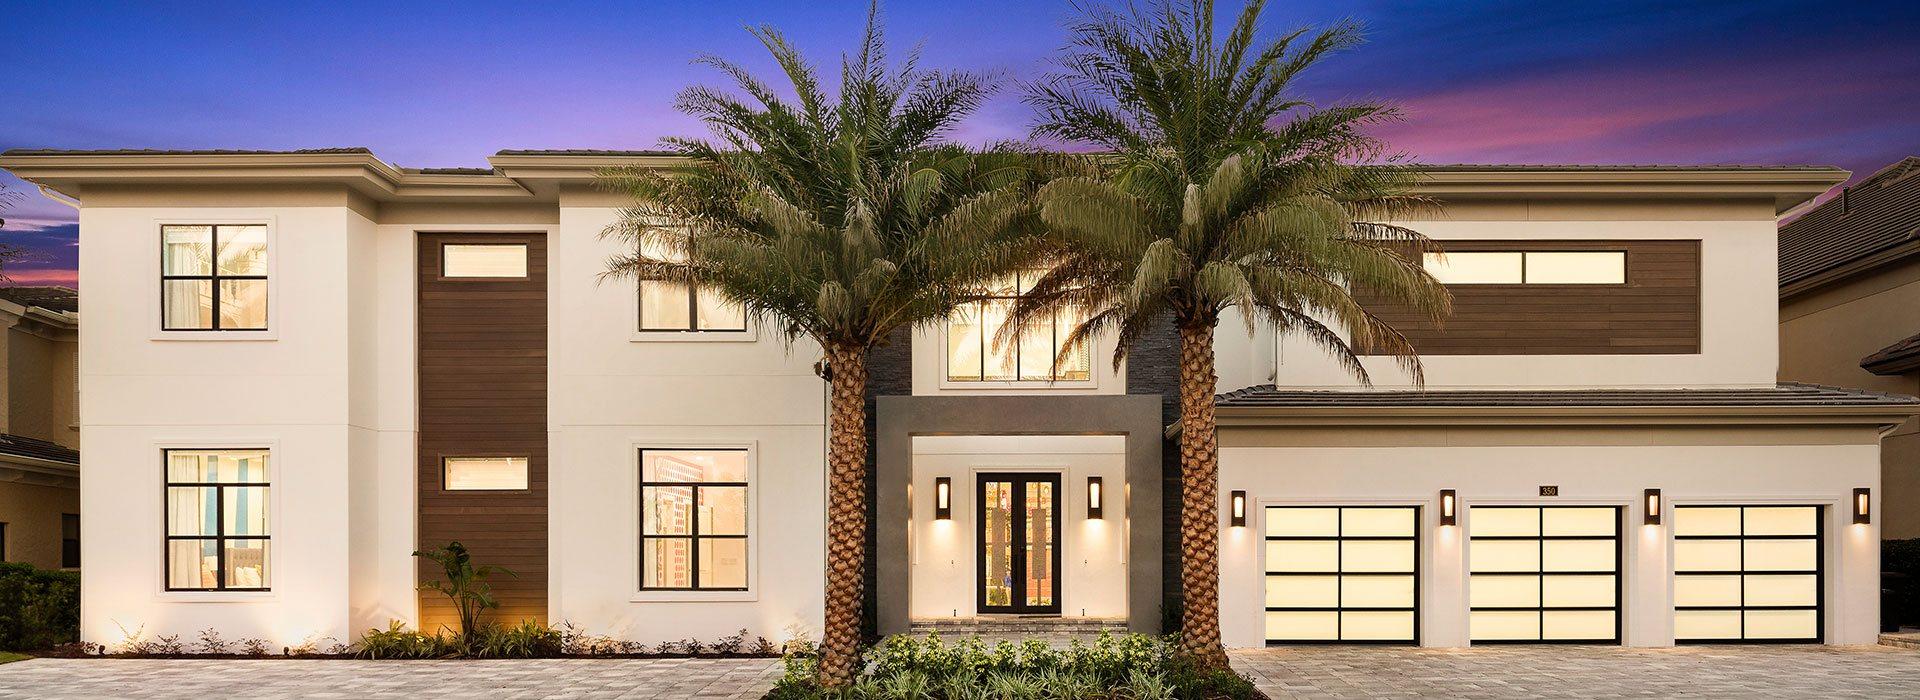 Reunion Resort Rentals | Luxury Orlando Villas & Vacation Homes